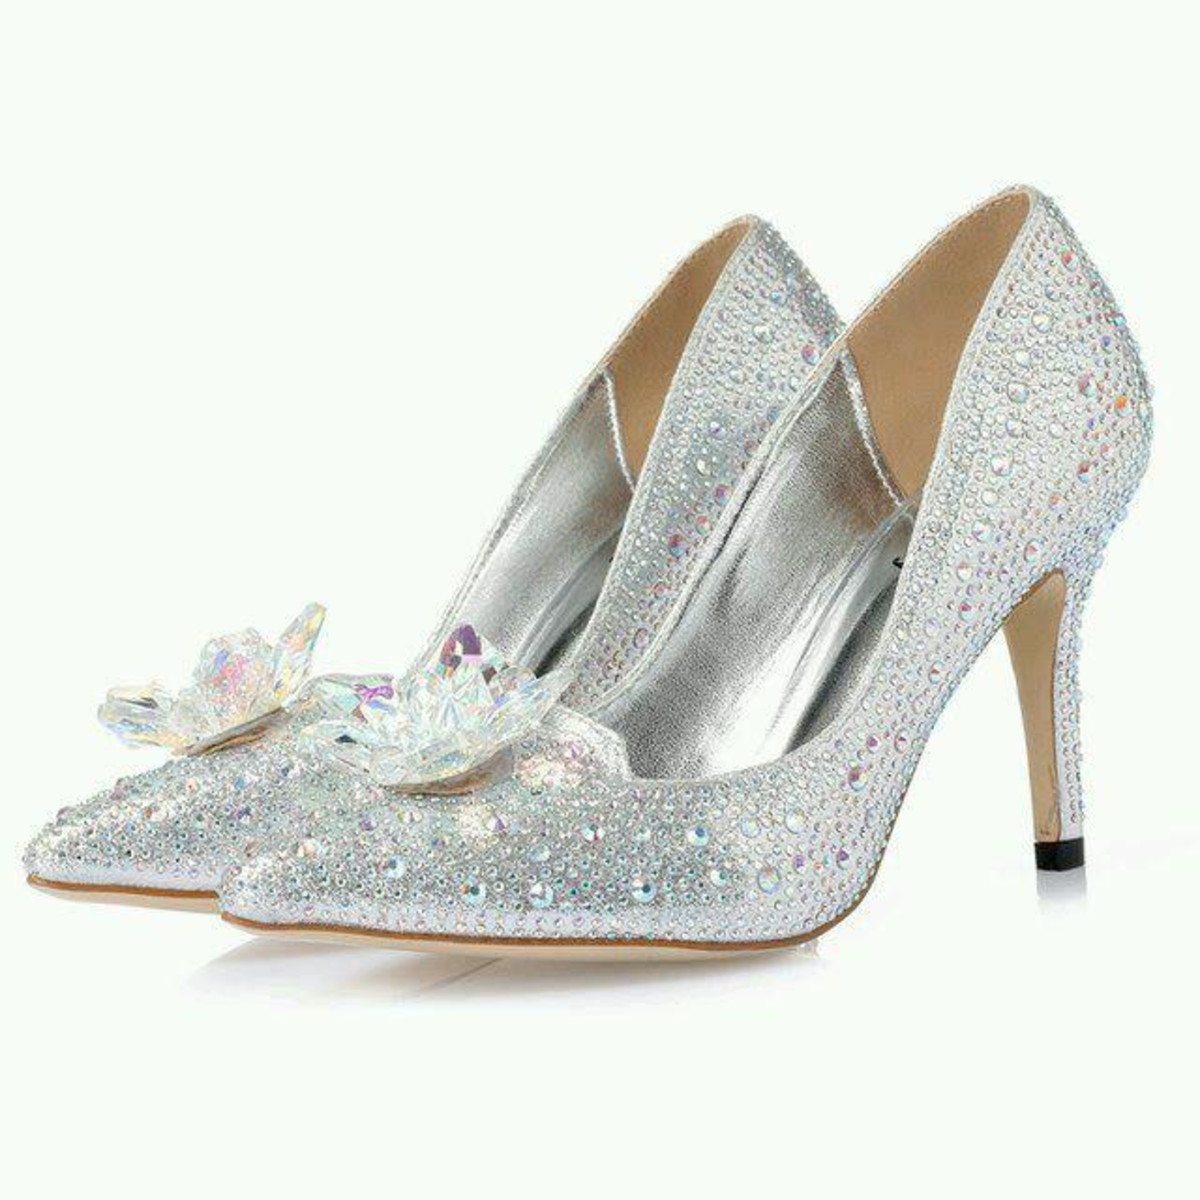 adc3726ce4 Sapato - Debutantes- noivas personalizados. no Elo7